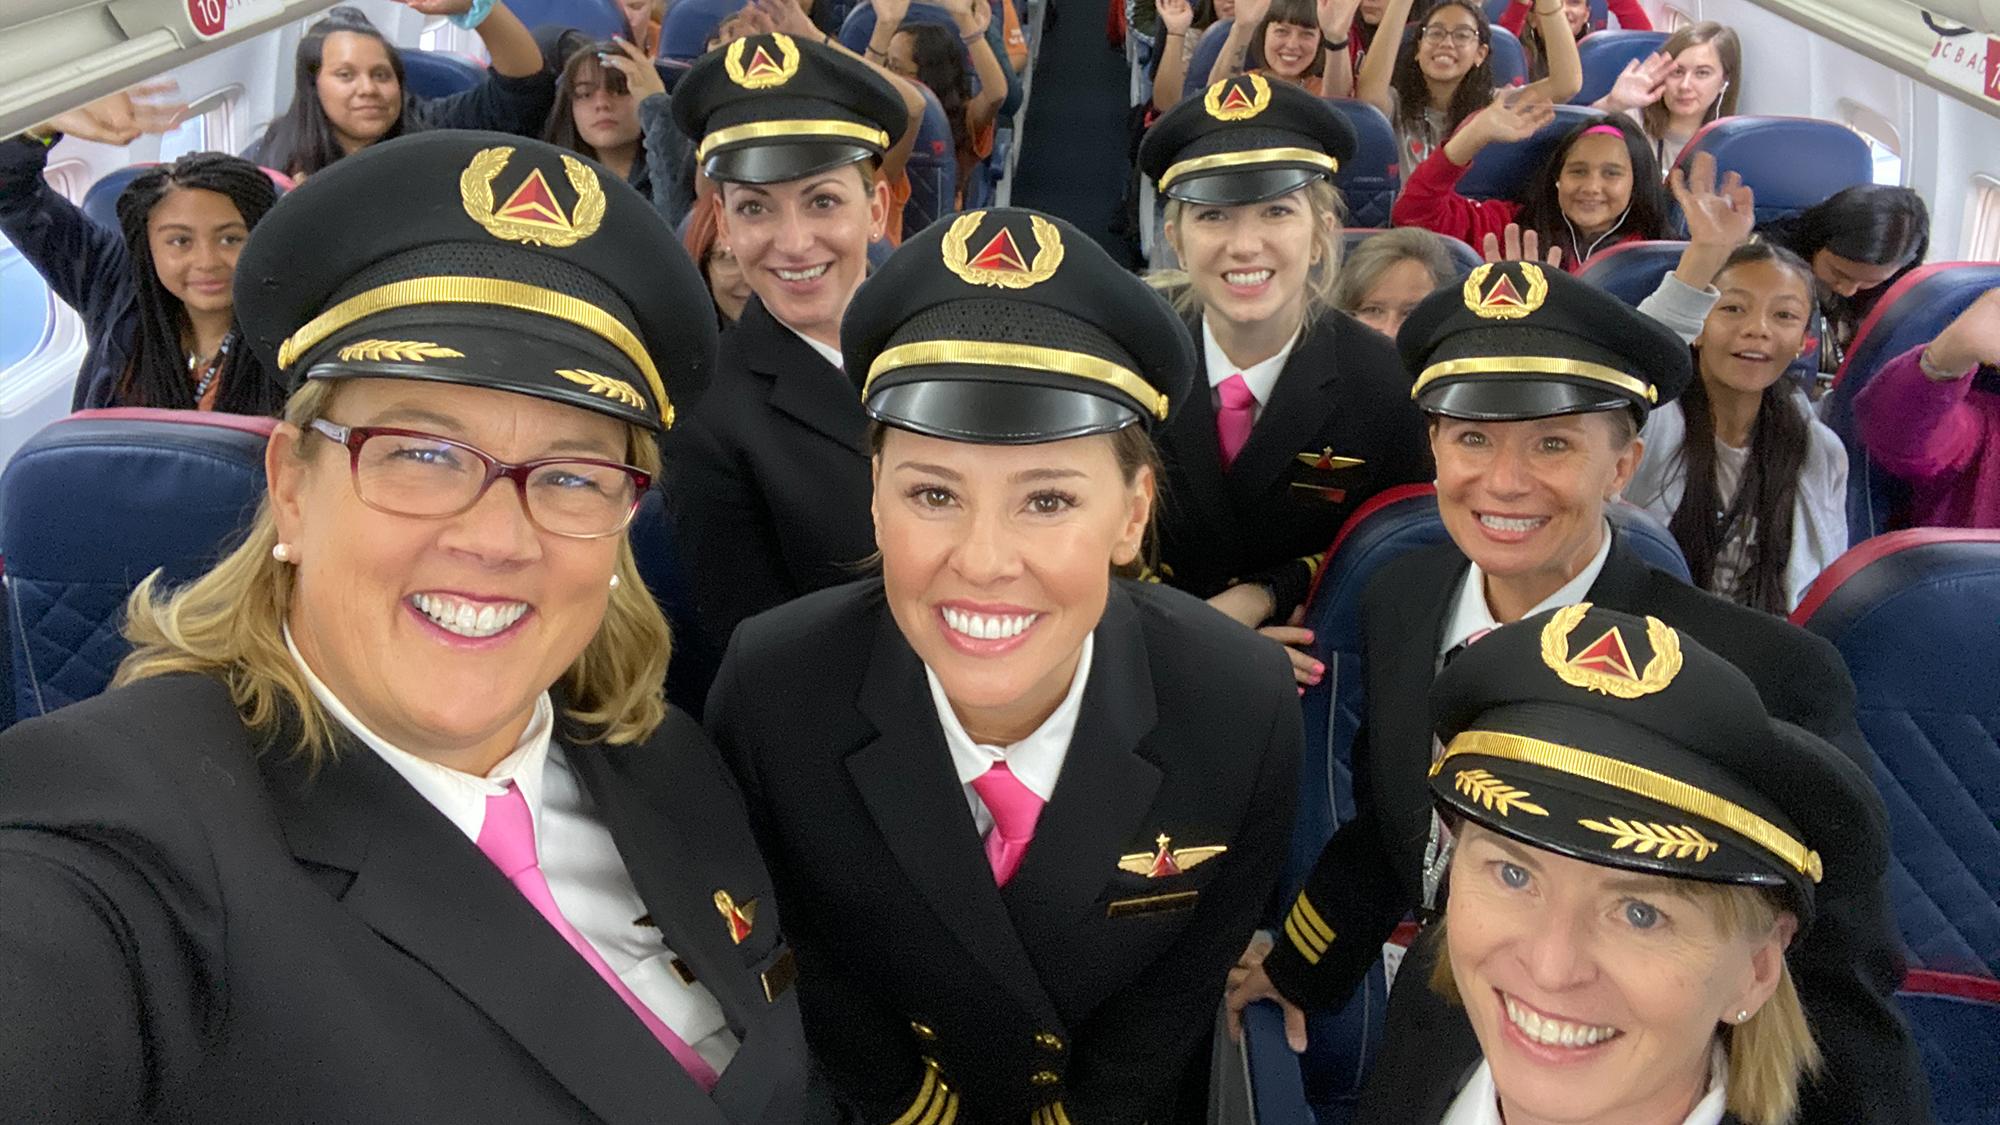 Delta all female flight crew to NASA